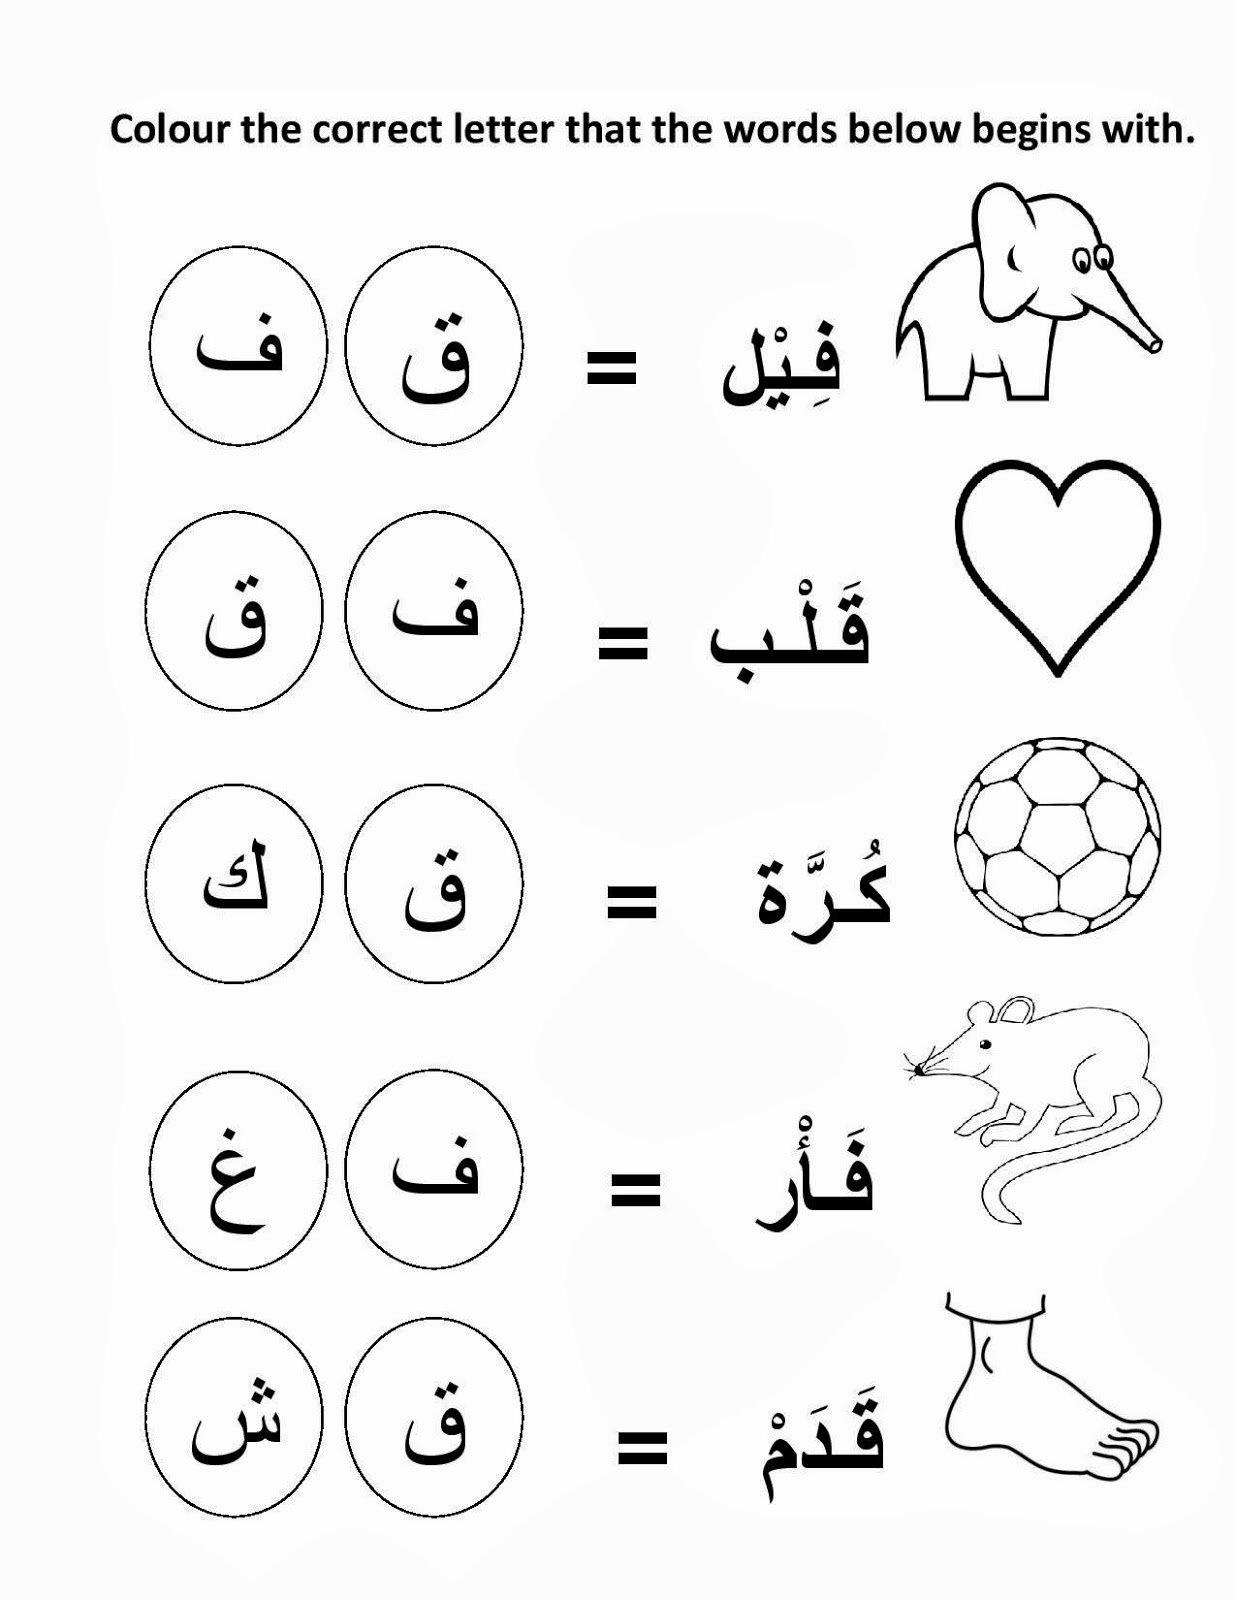 Arabic Alphabet Worksheets for Preschoolers Fresh Worksheets Arabic Alphabet Letter Tracing Worksheets